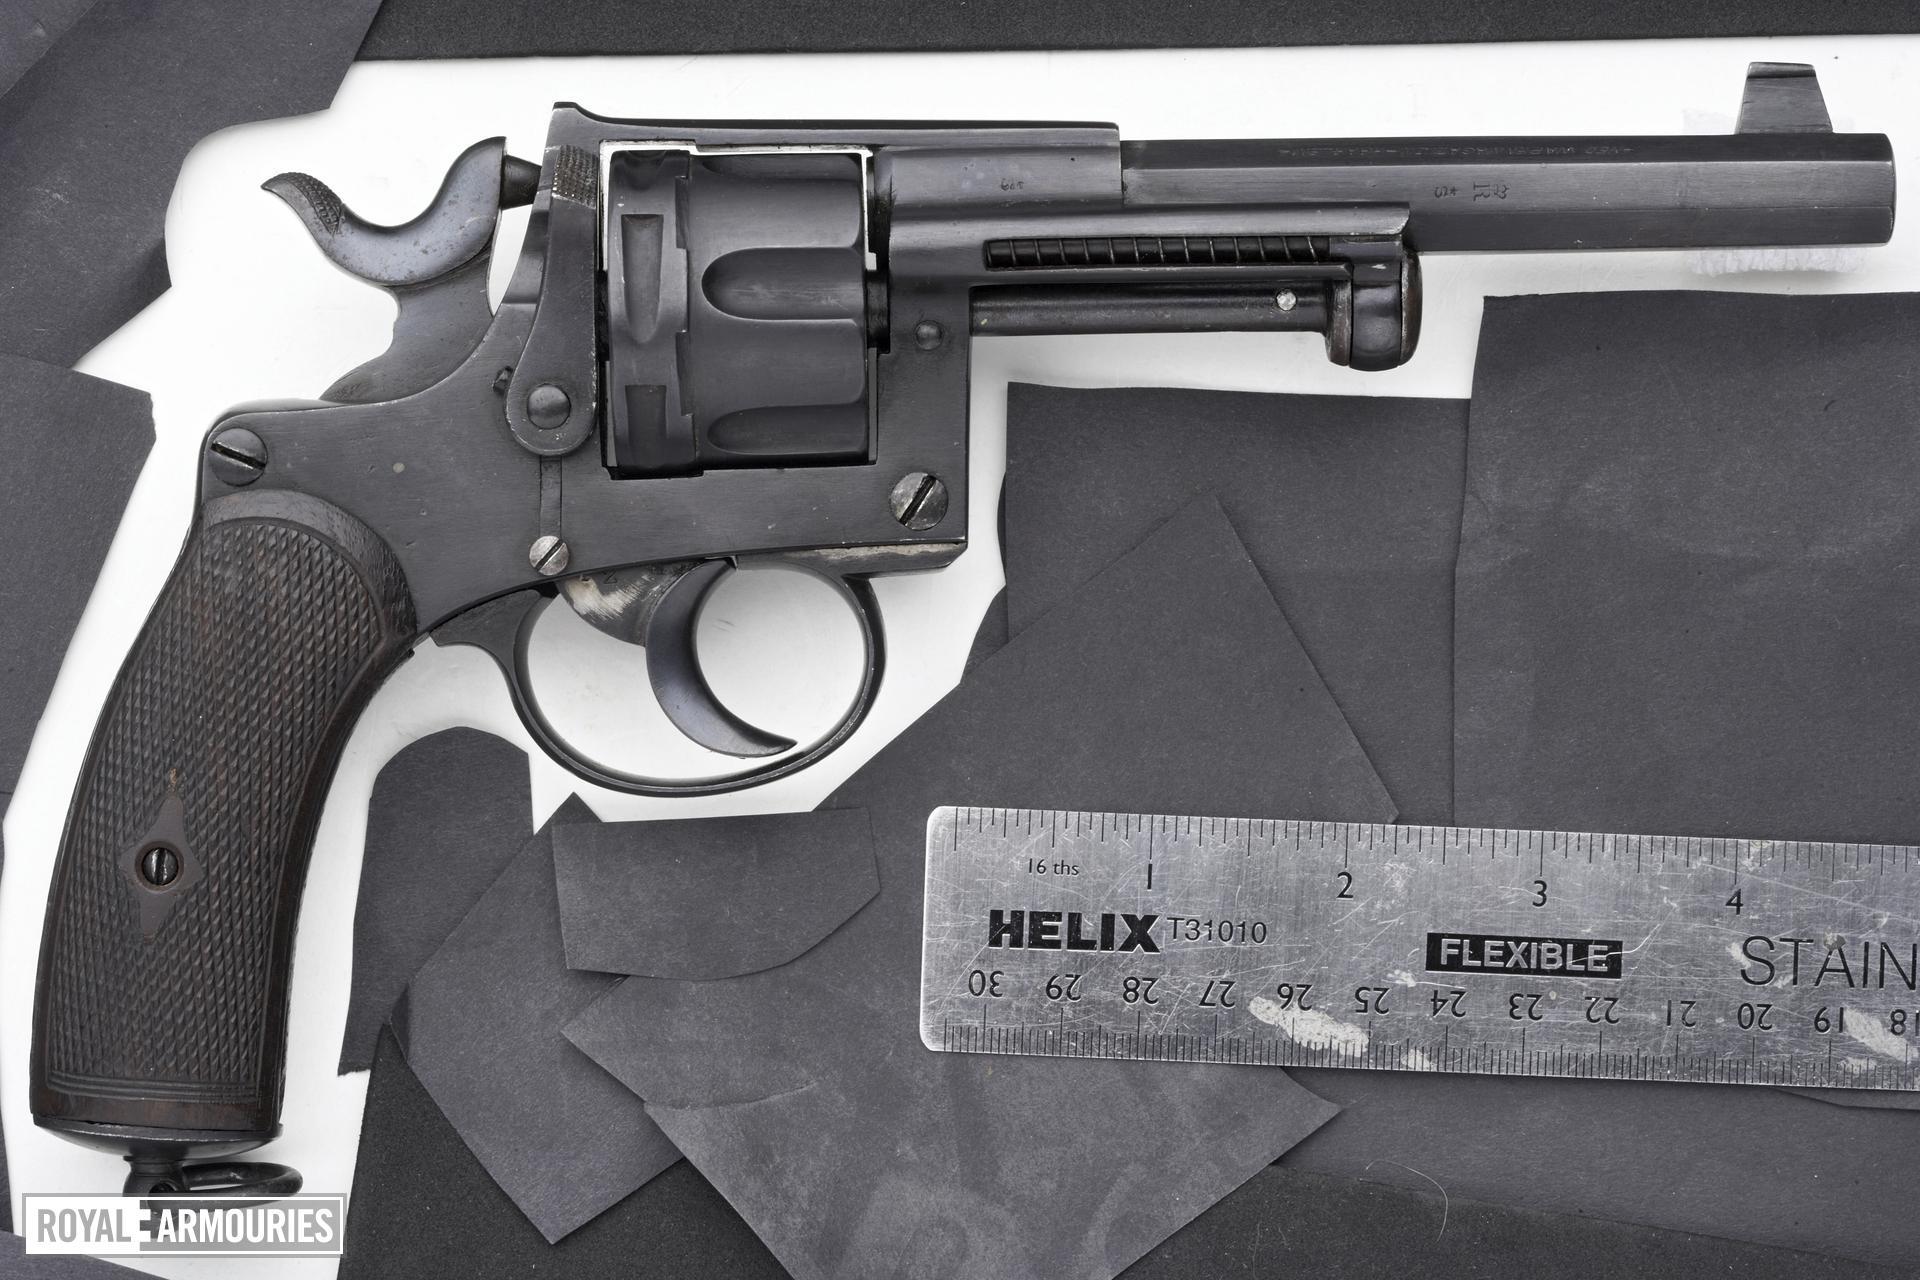 Rimfire six-shot revolver - Ordnance Model 94